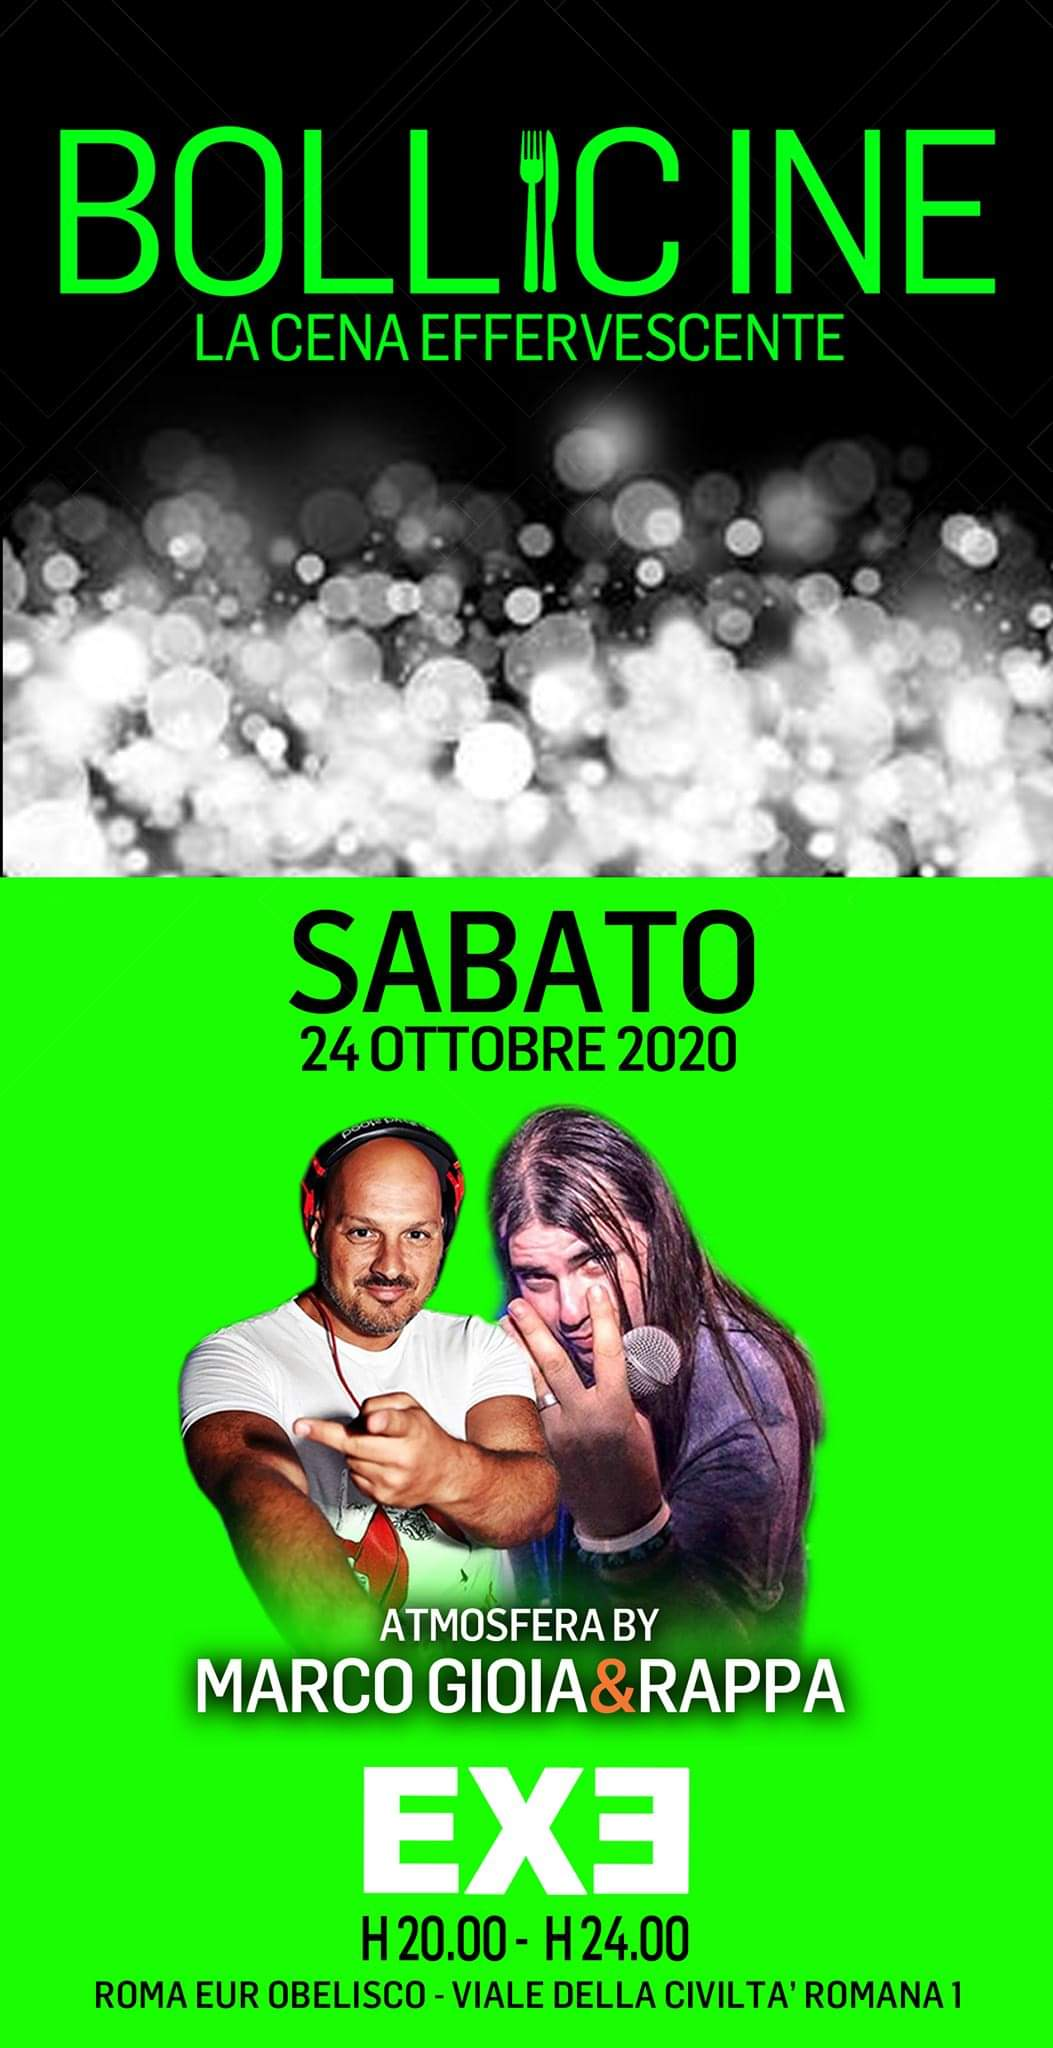 Exe sabato 24 ottobre 2020. Cena Spettacolo Atmosfera Marco Gioia + Rappa